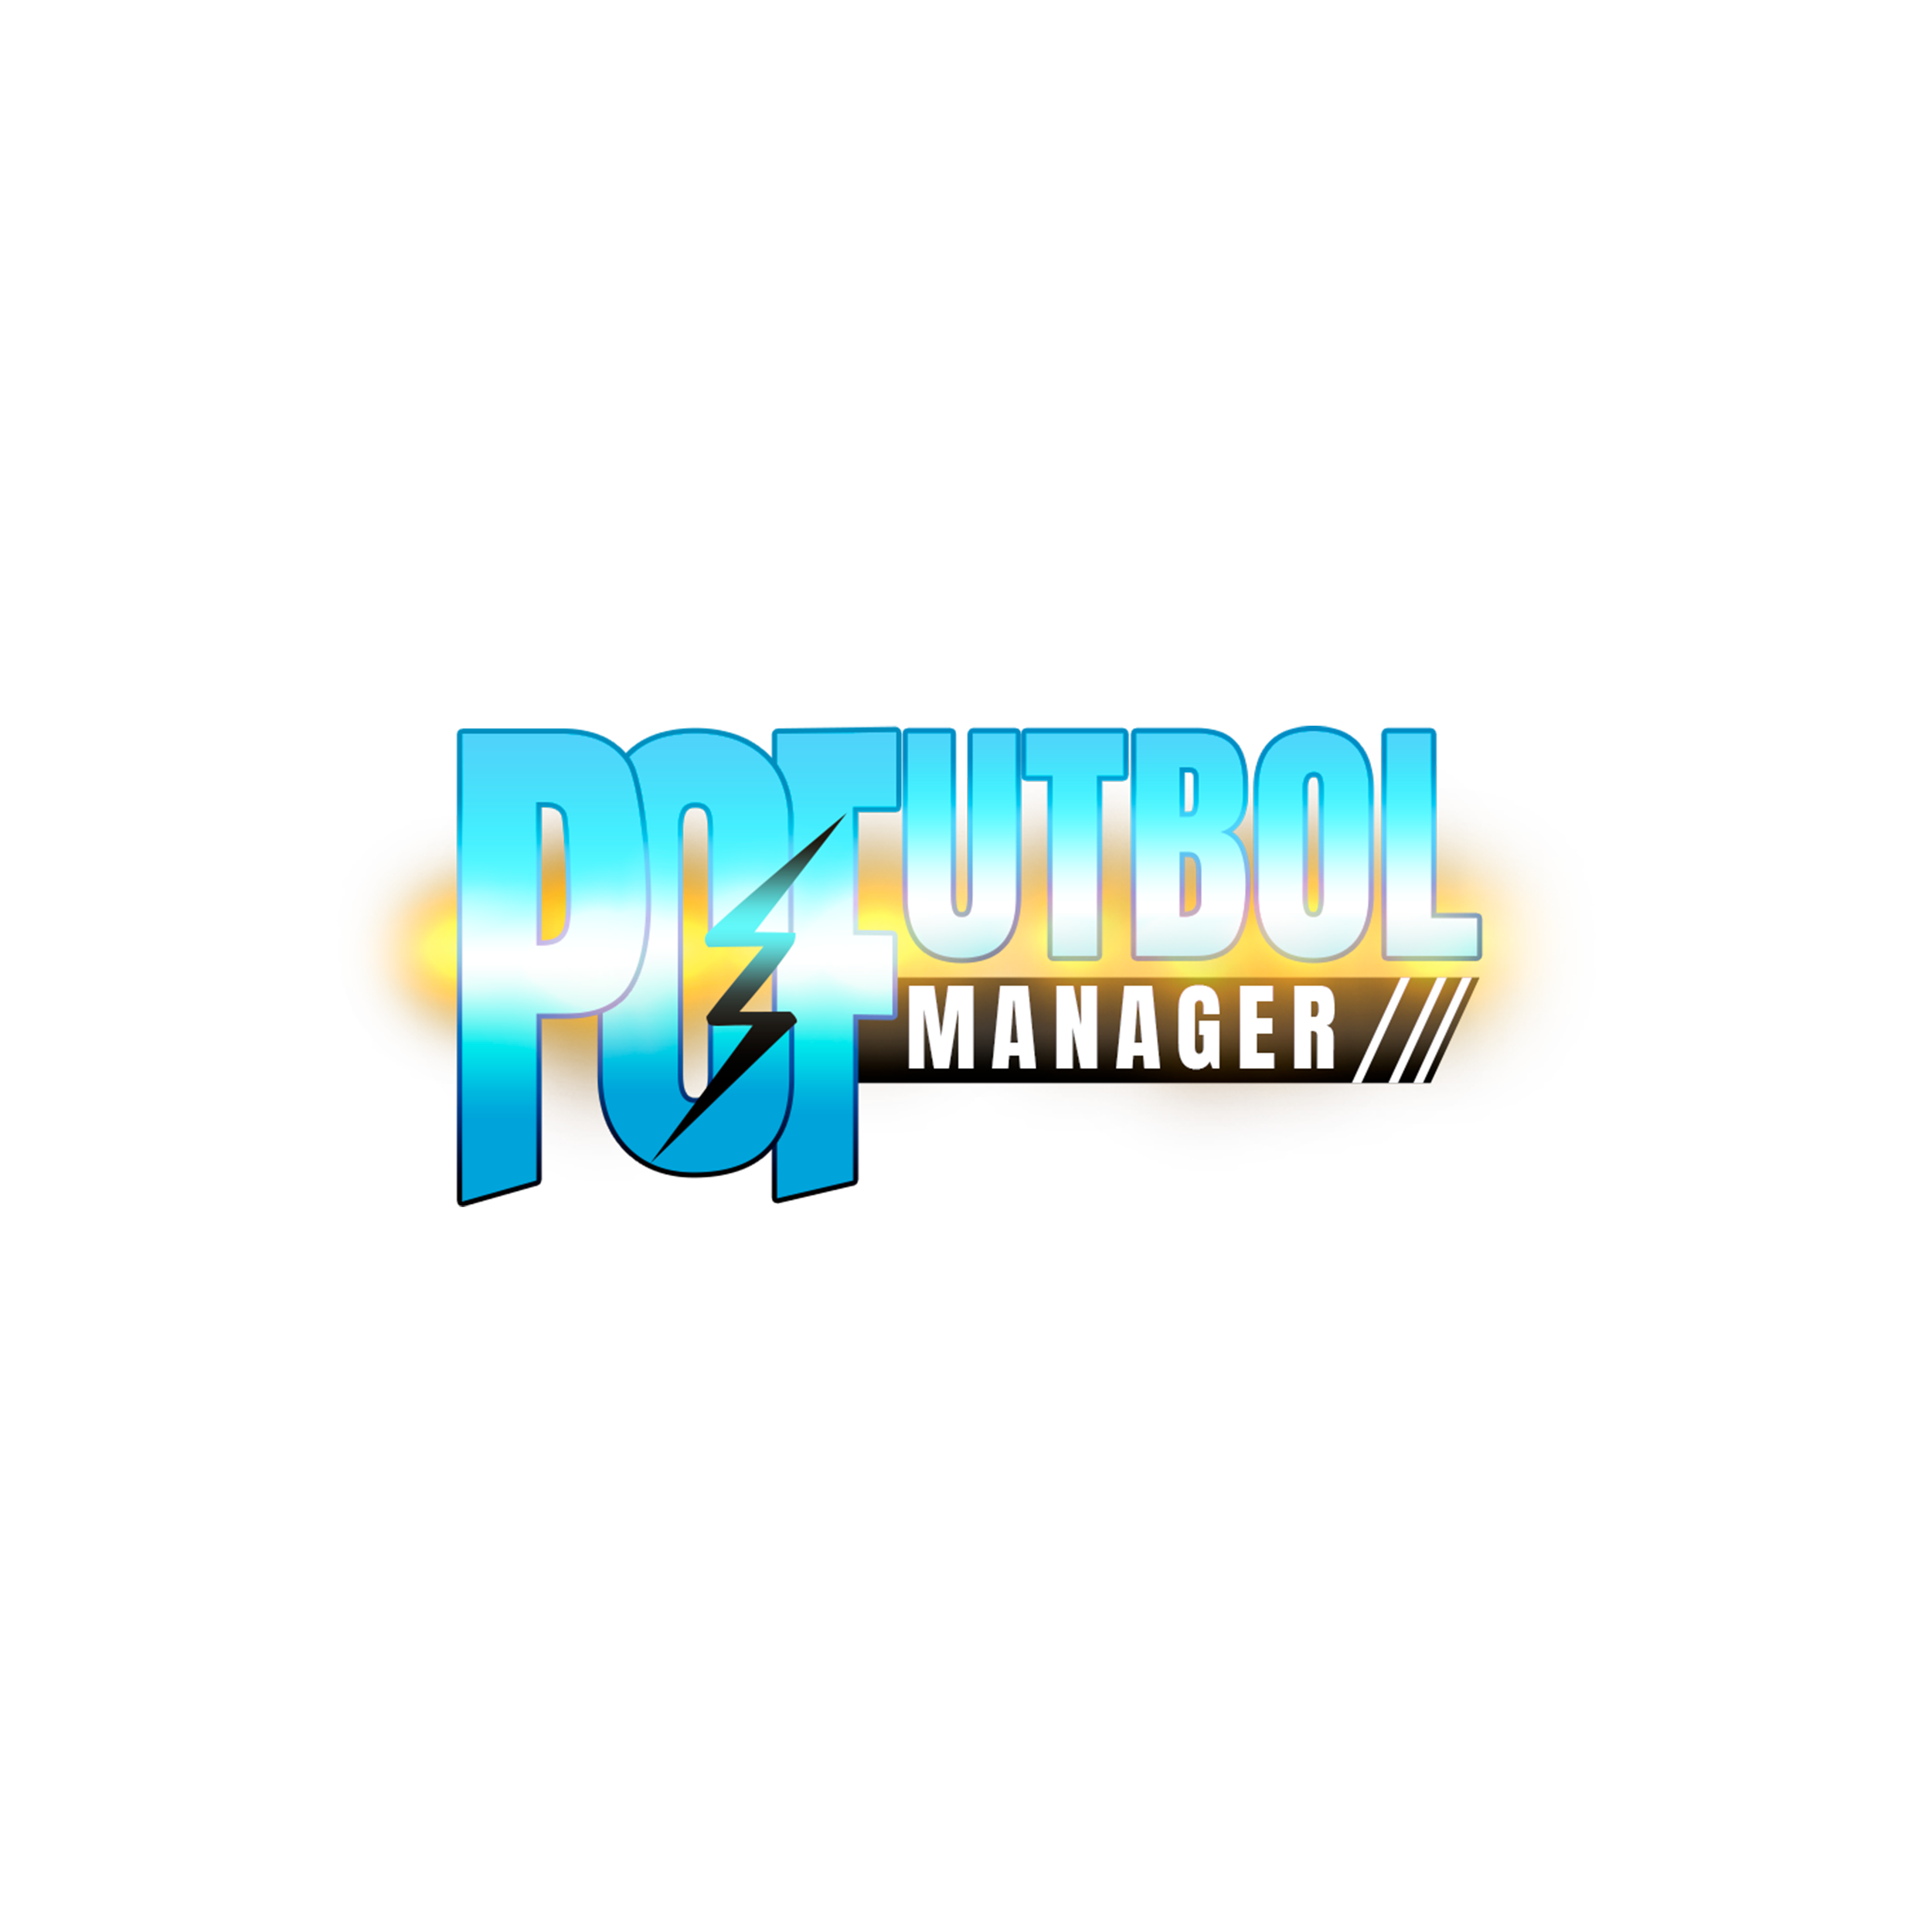 PC Fútbol Manager logo